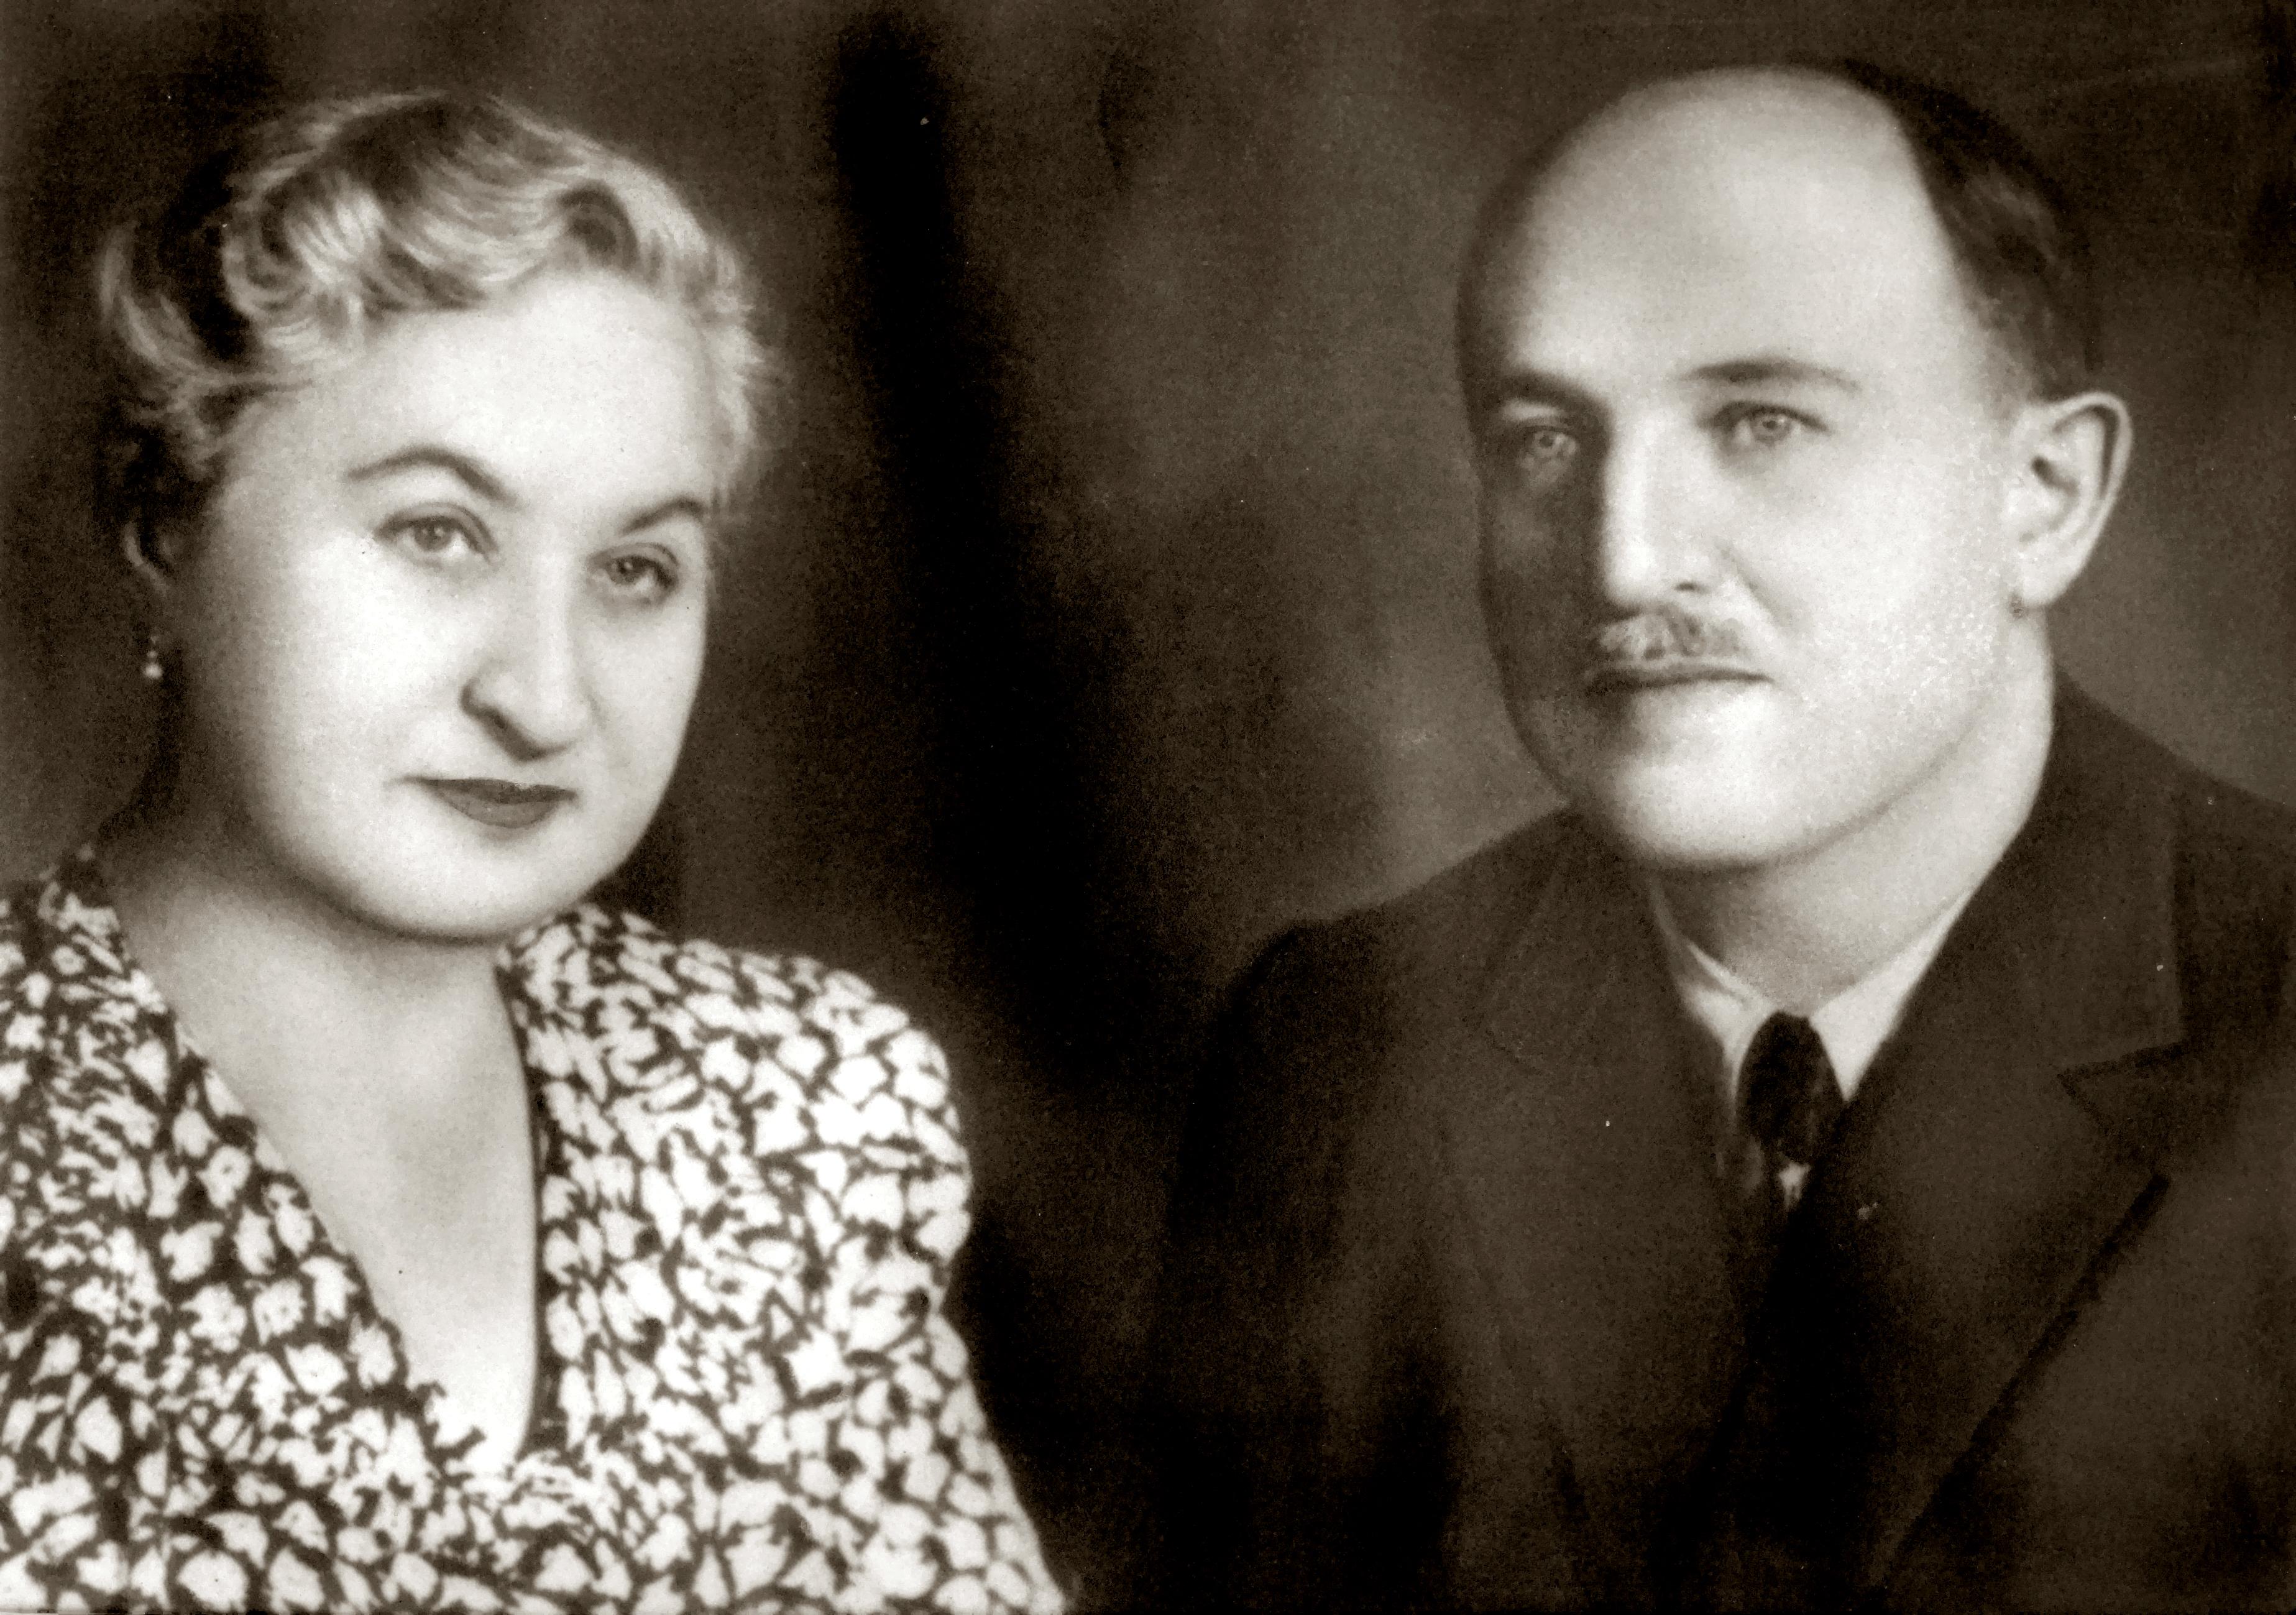 Bernard and Adela Iszakovics